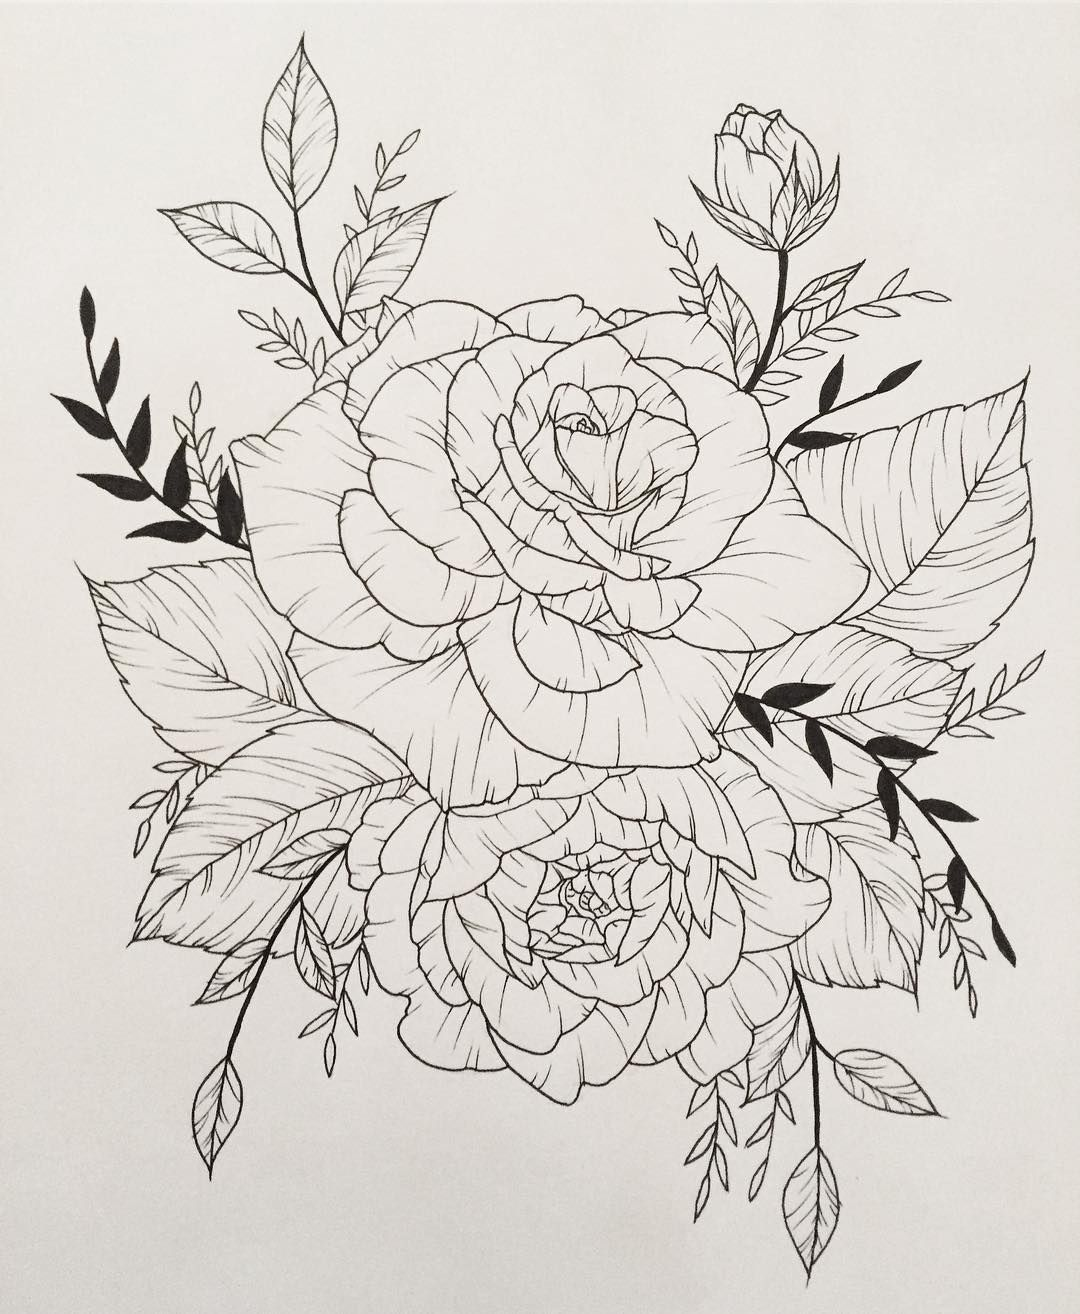 Roses Rose Flowers Tattoo Flash Leaves Linedrawing Art Drawing Illustration Design Blossom Rose Outline Tattoo Flower Tattoo Drawings Drawings